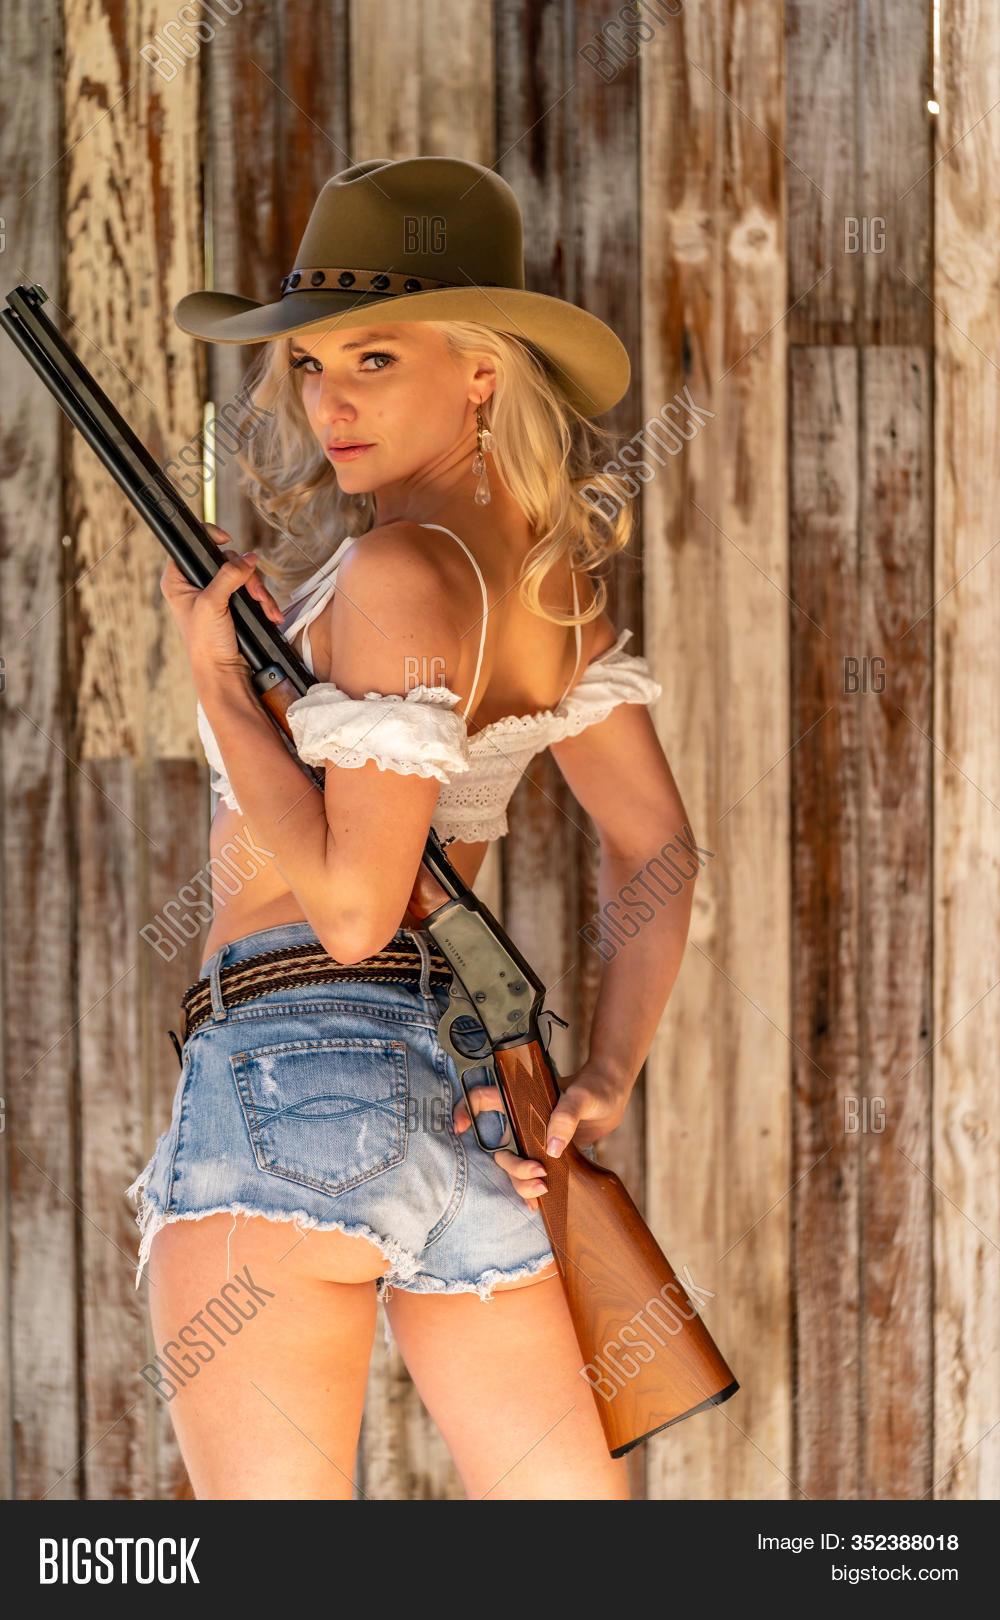 Gorgeous Blonde Model Image Photo Free Trial Bigstock